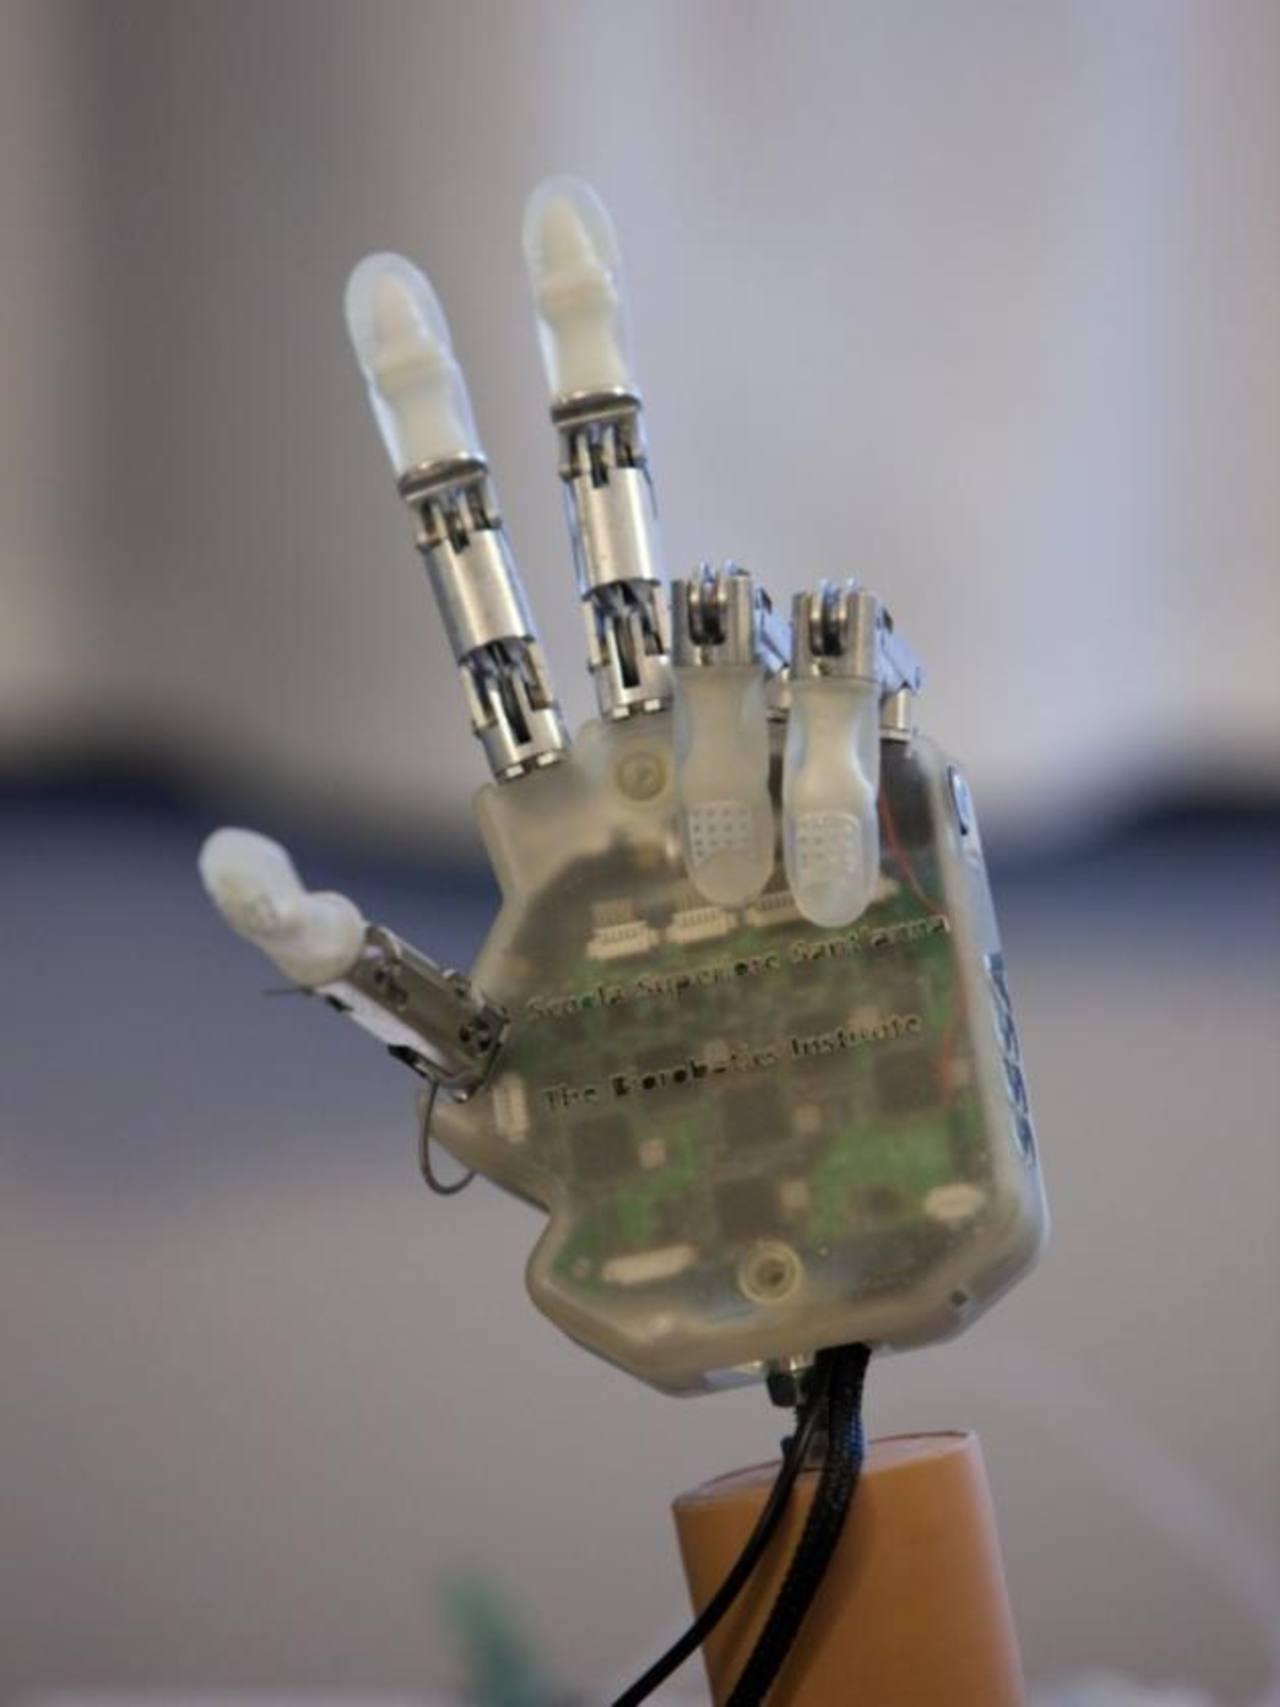 Crean sofisticada mano artificial con sentido del tacto